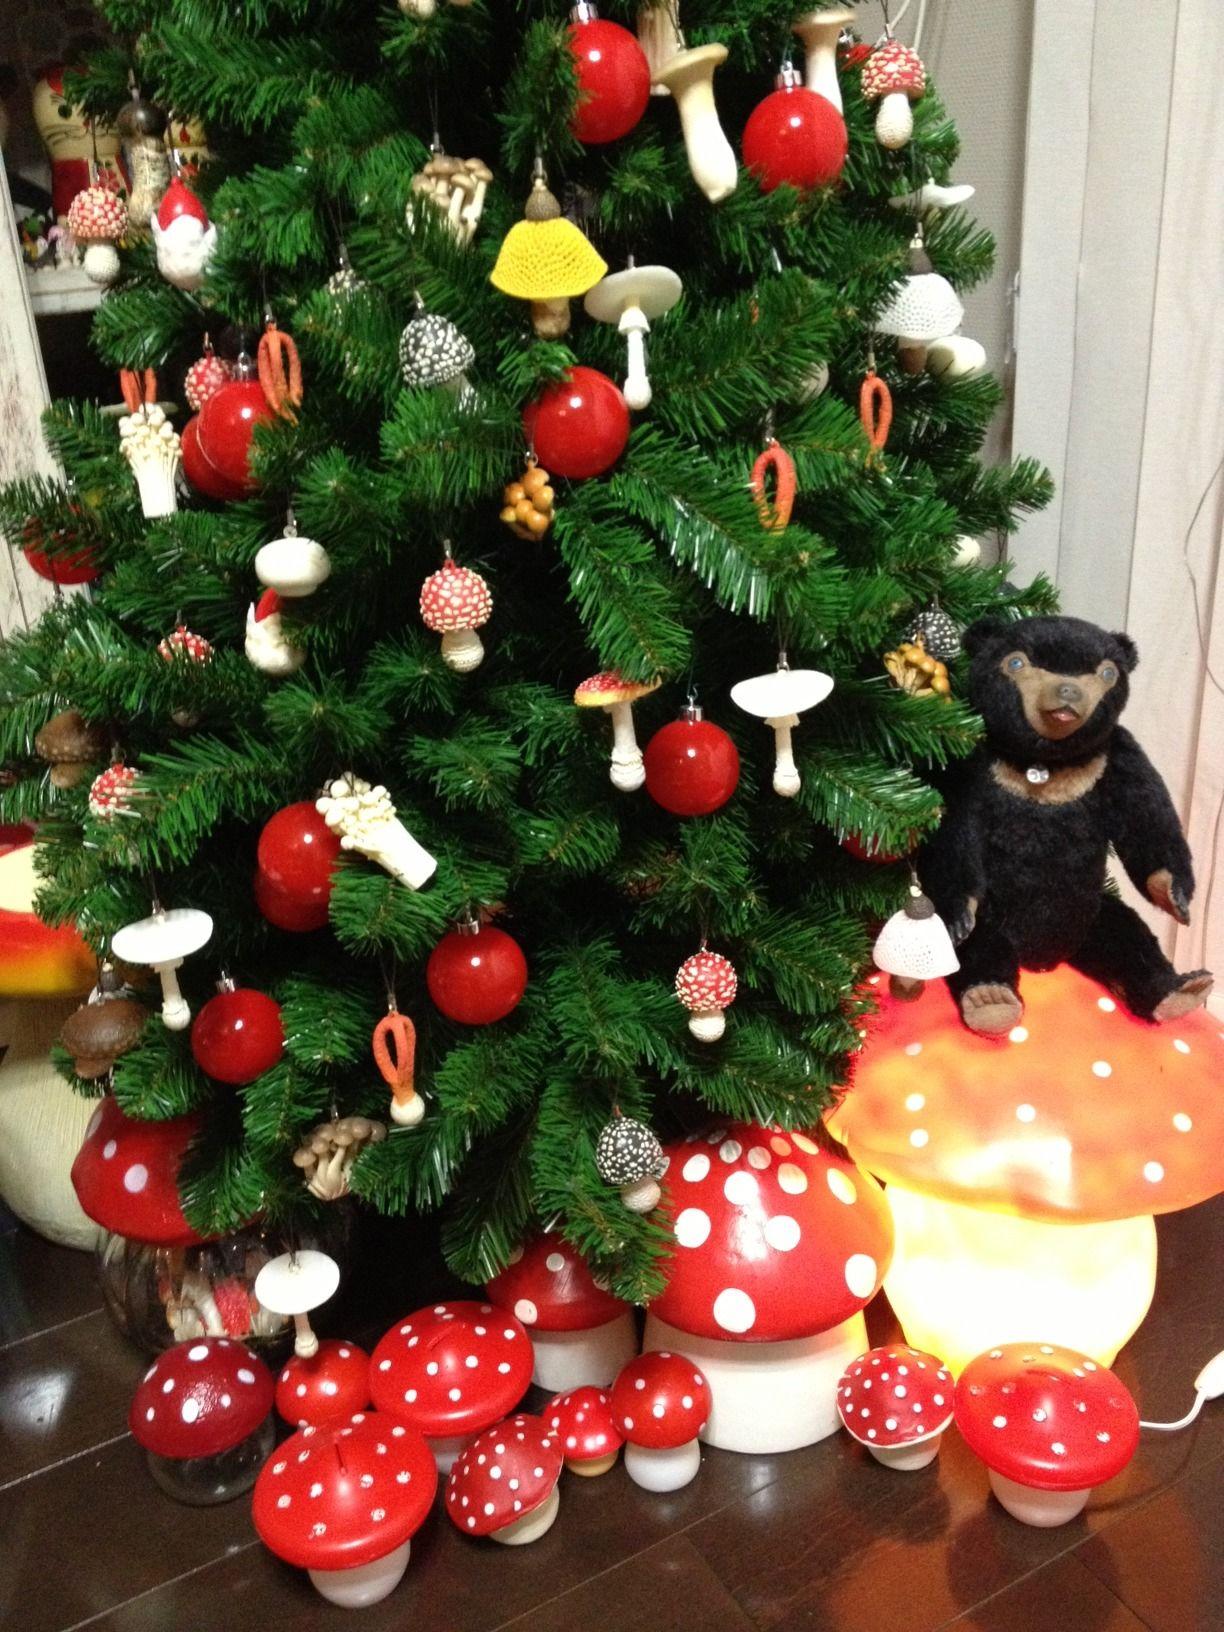 Germanic paganism amazing tabletop christmas trees decorating plan - Toadstool Red And White Mushroom Christmas Tree